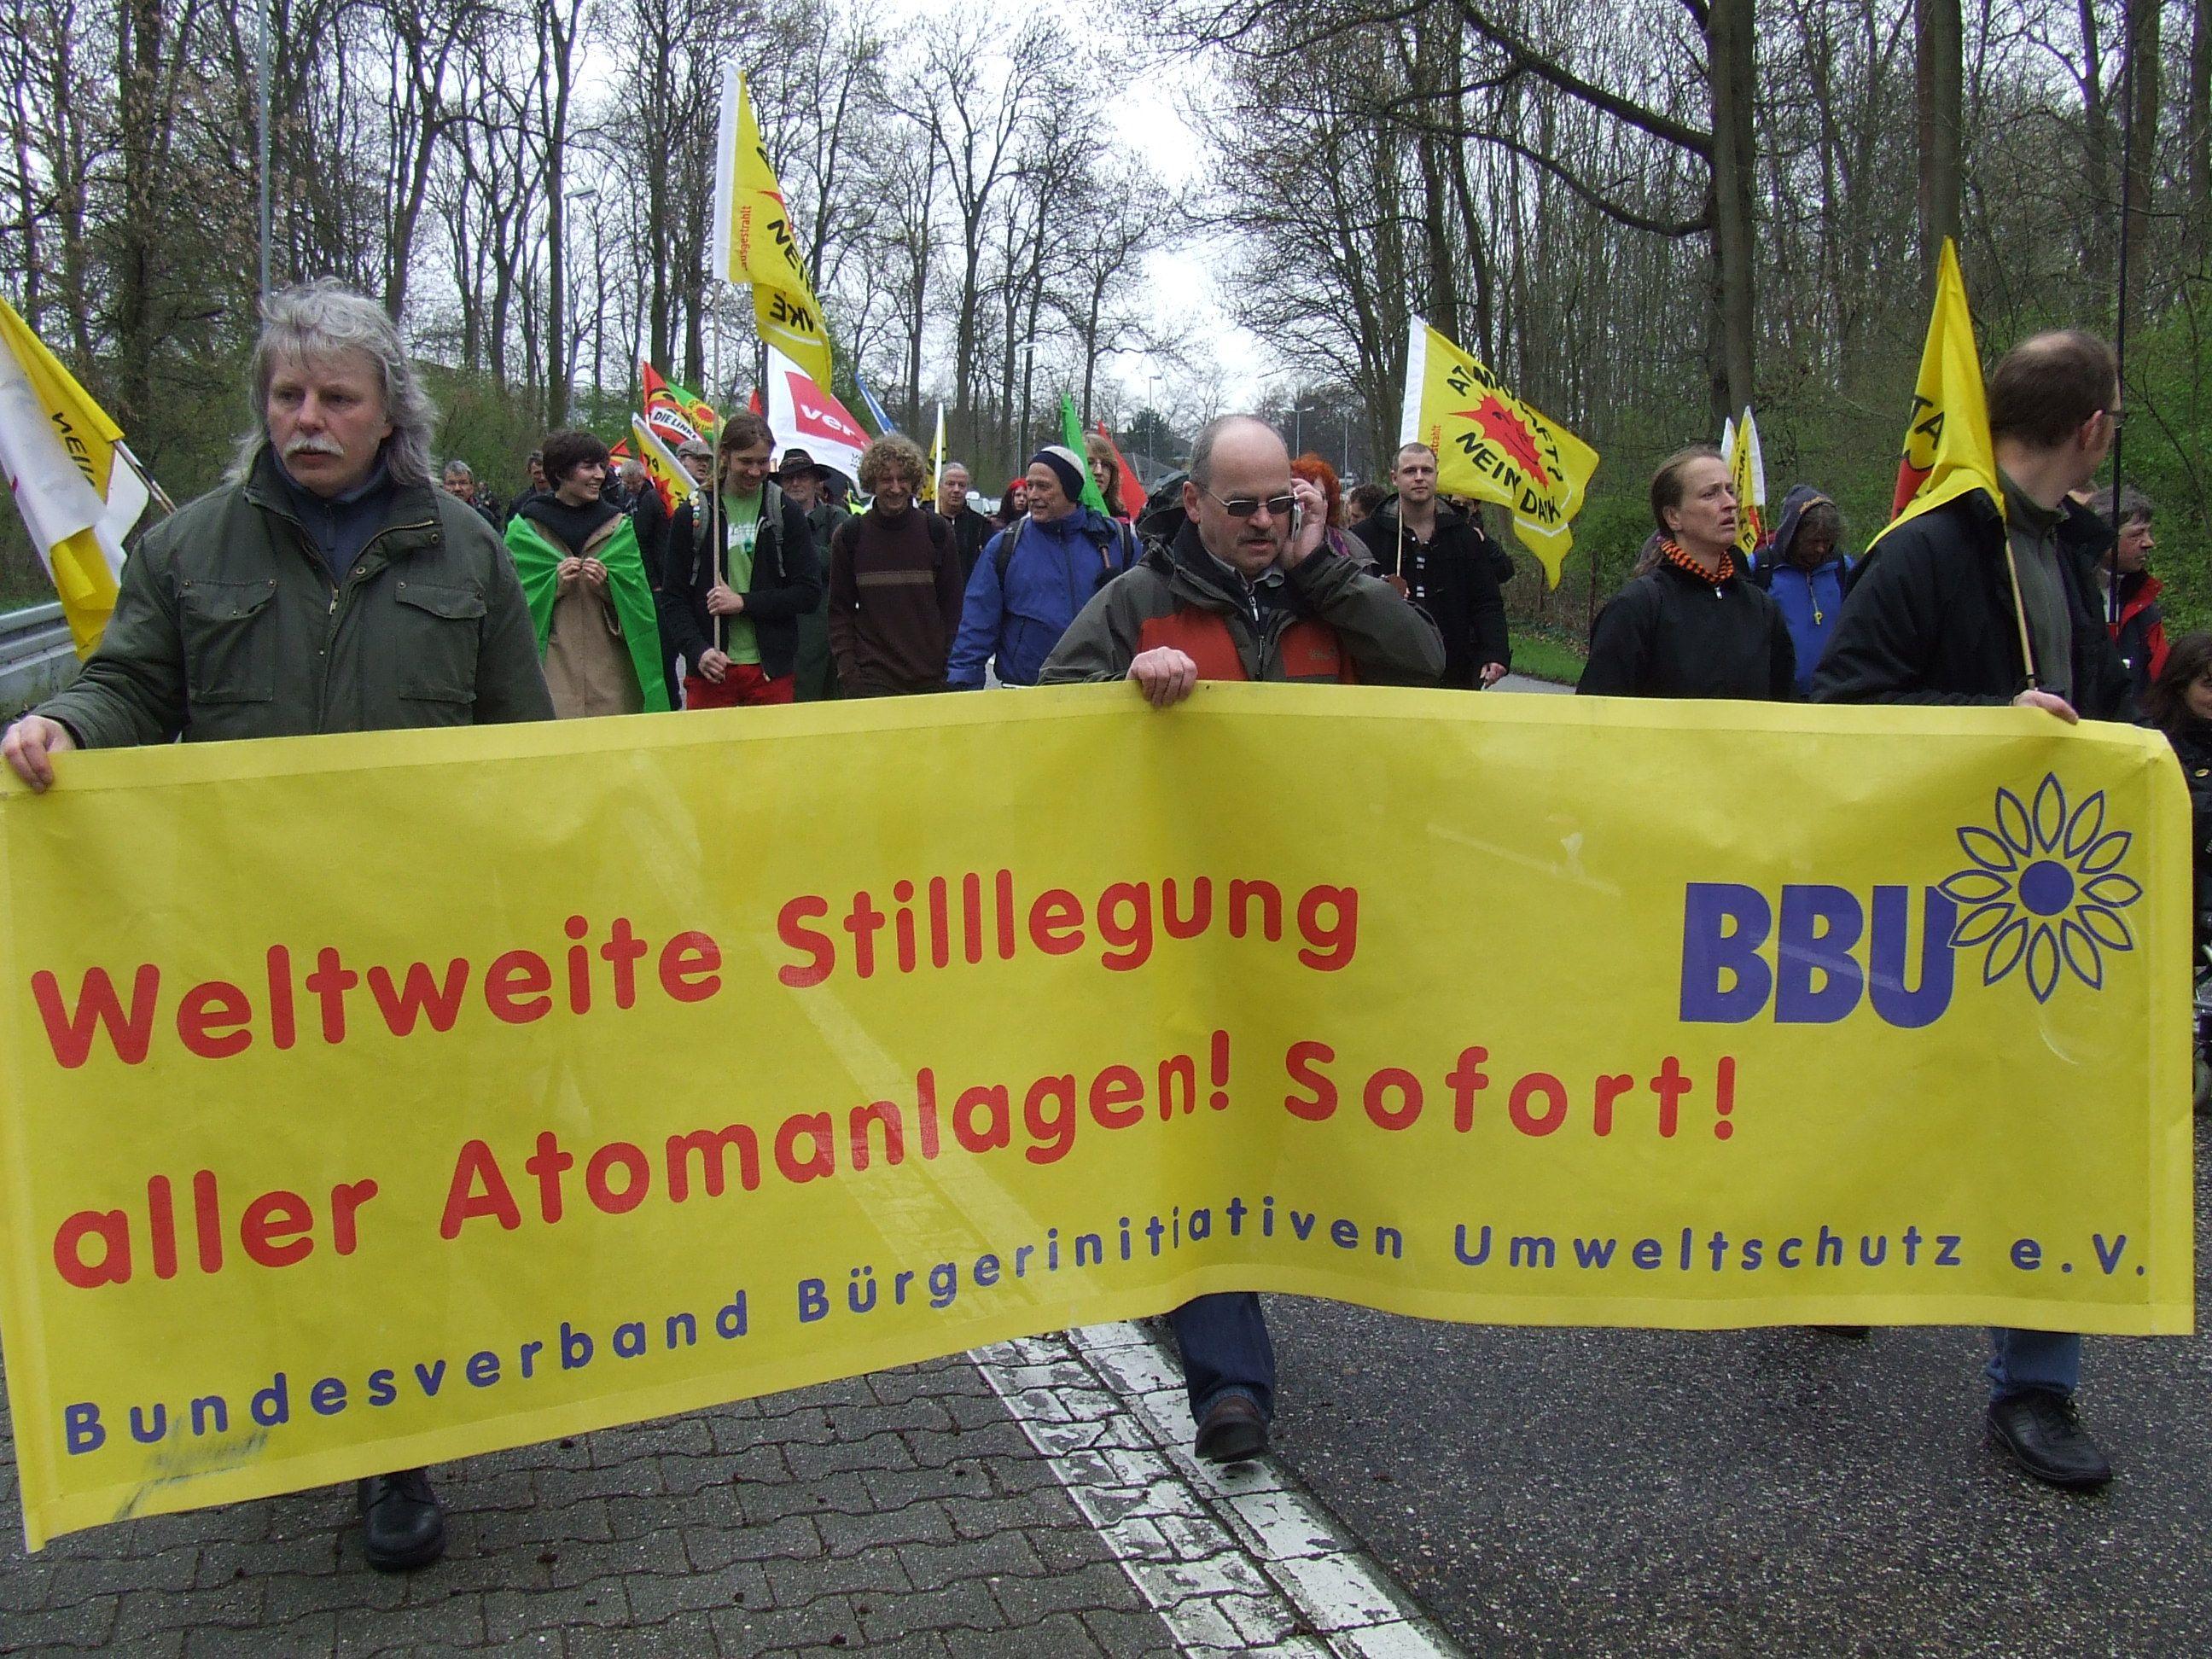 http://www.umwelt-energie-report.de/wp-content/uploads/2017/04/13.04.17-Atom-Ostermarsch.jpg